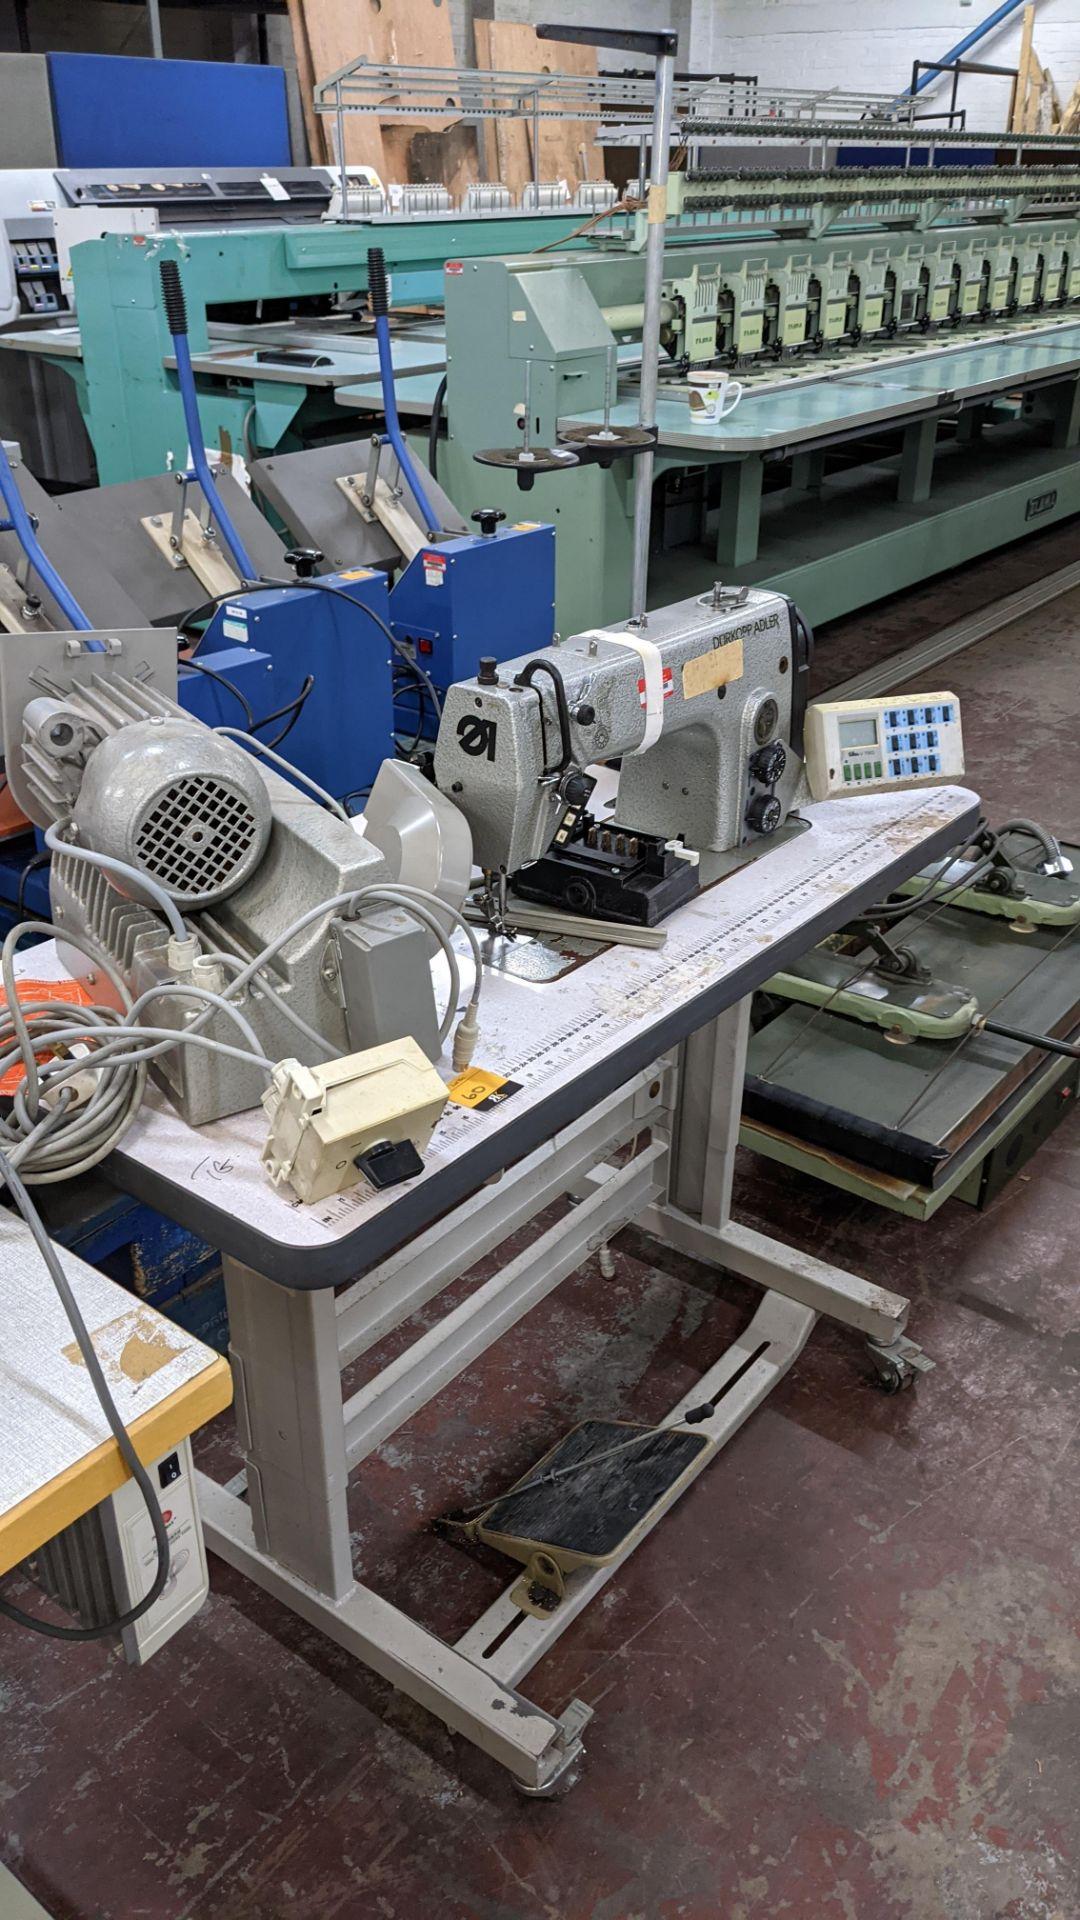 Durkopp Adler type 0271-L40042 sewing machine - Image 16 of 19